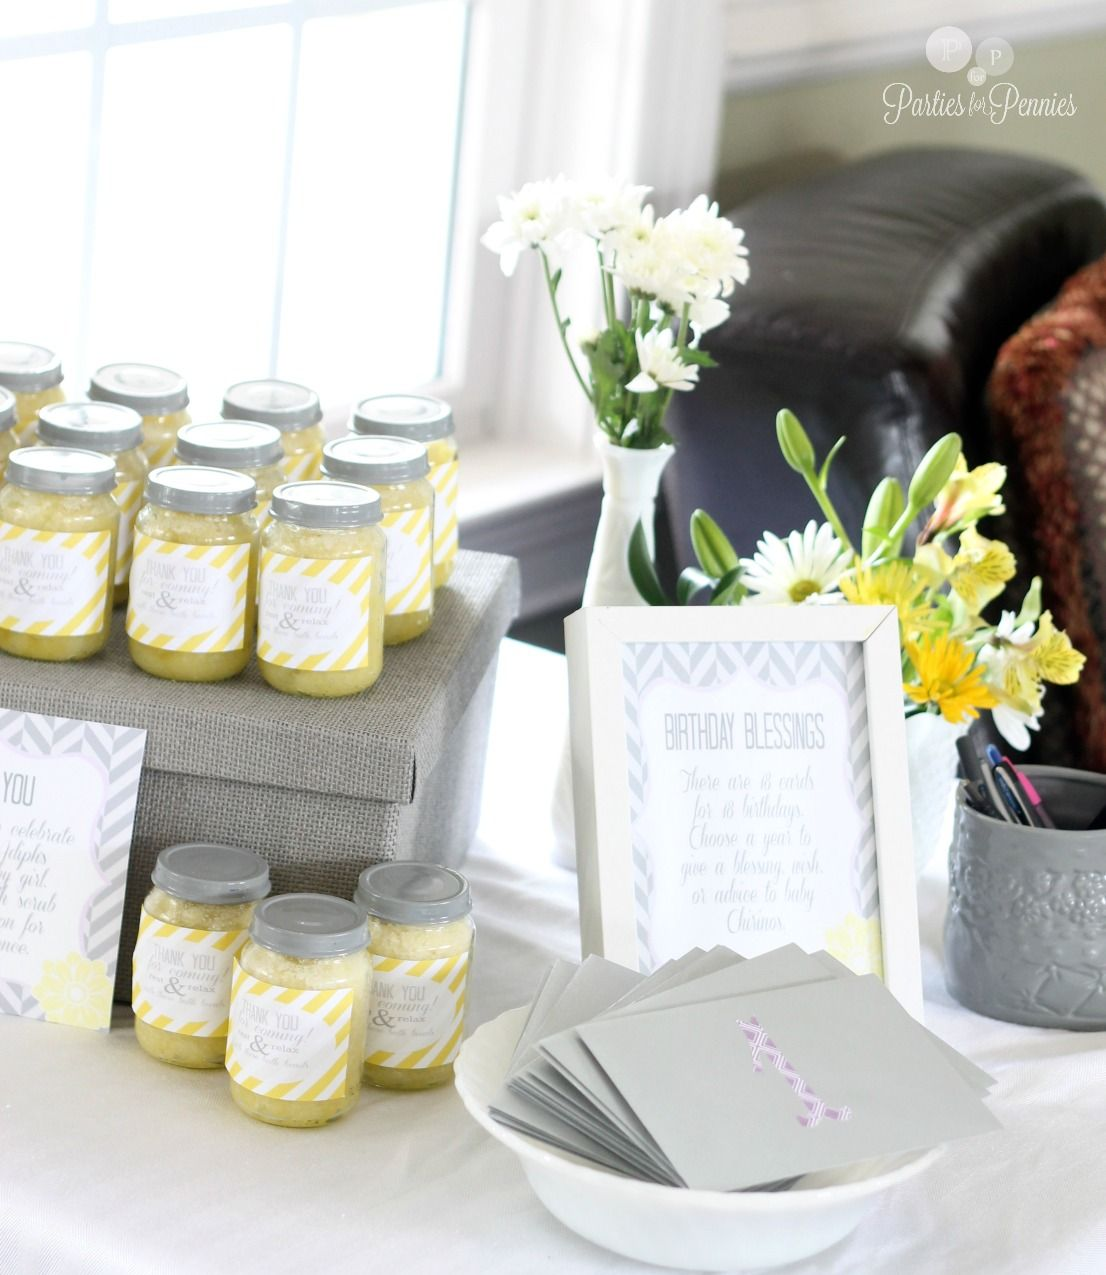 Home | Lemon sugar, Shower favors and Favors